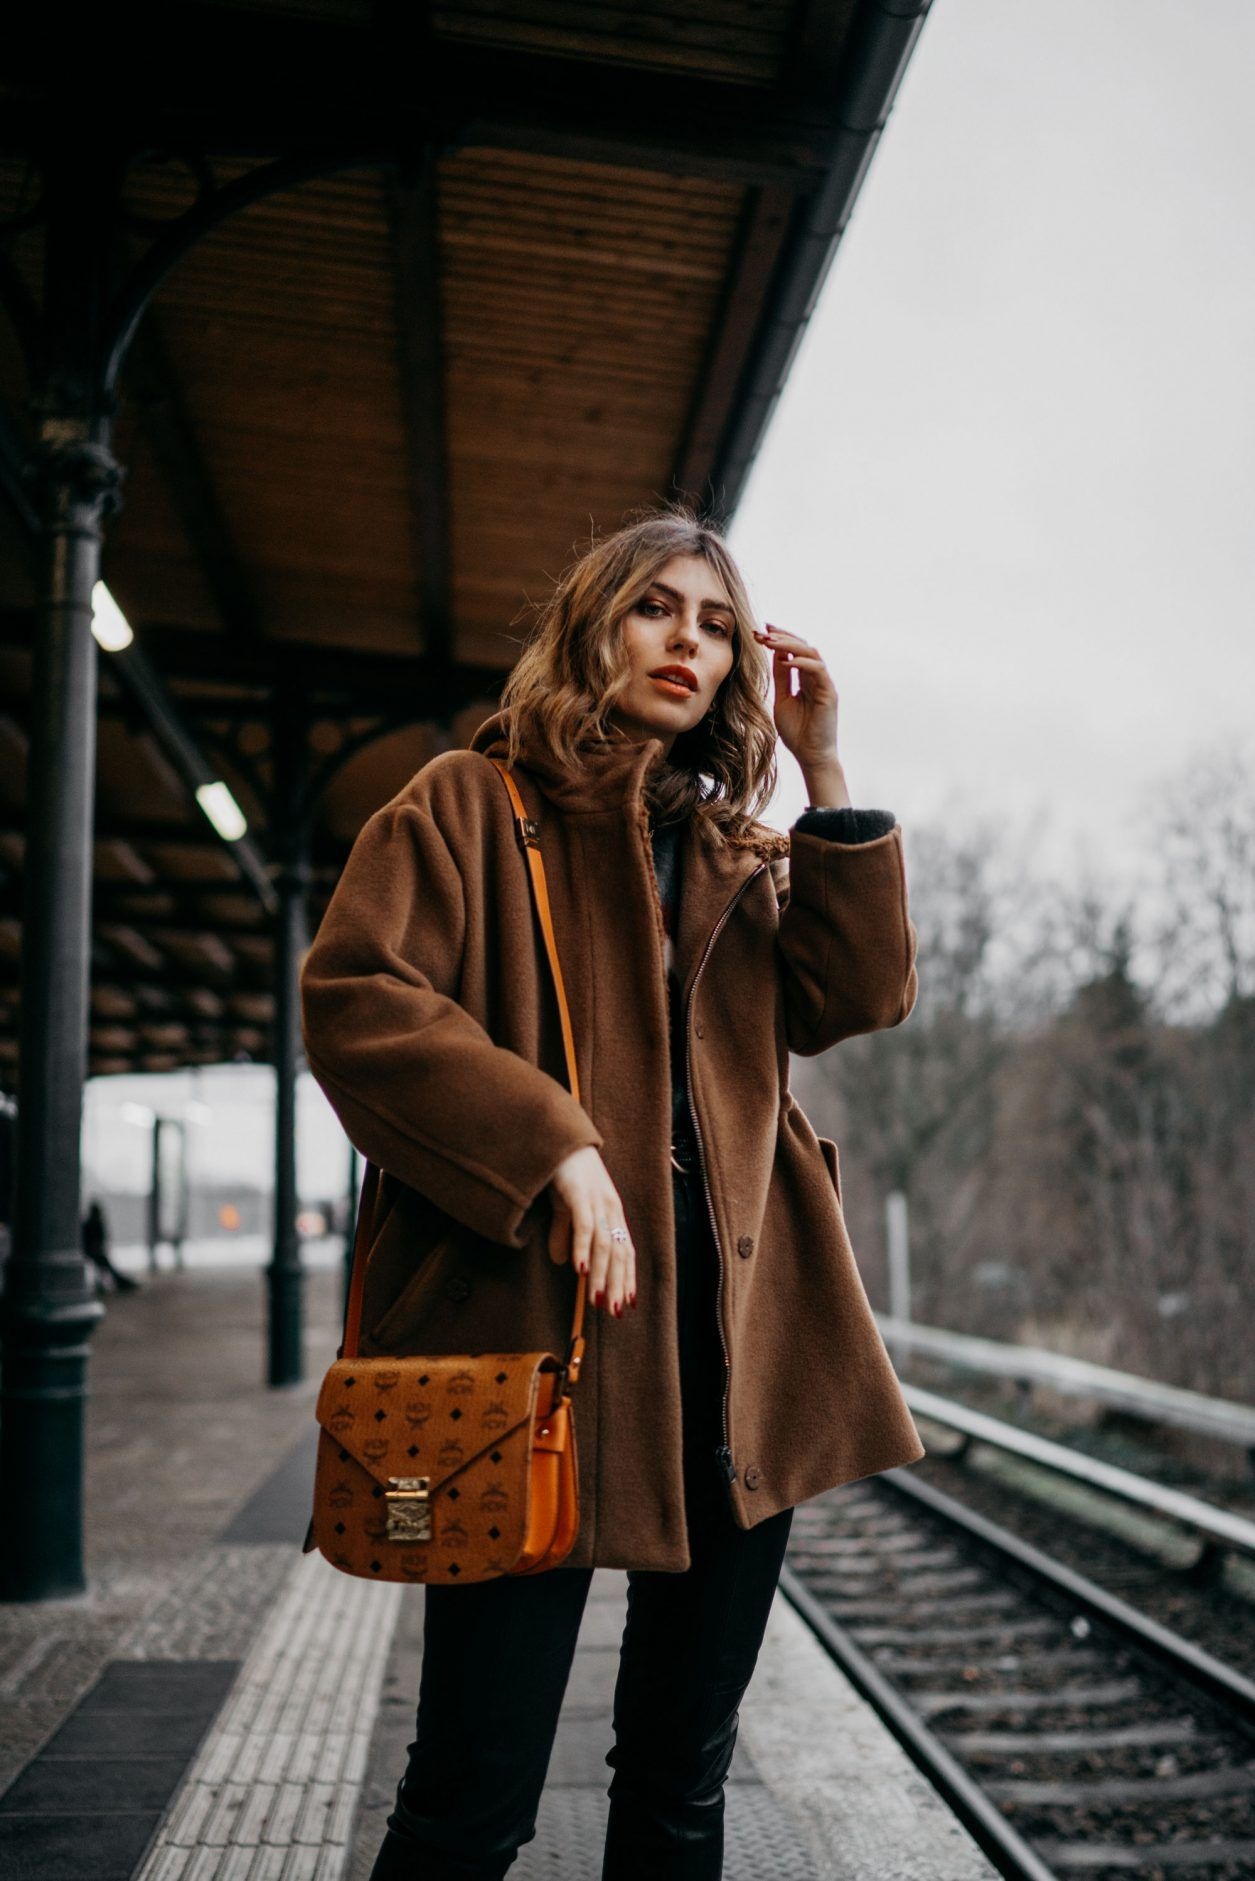 Street Style by Masha Sedgwick | Berlin fashion influencer